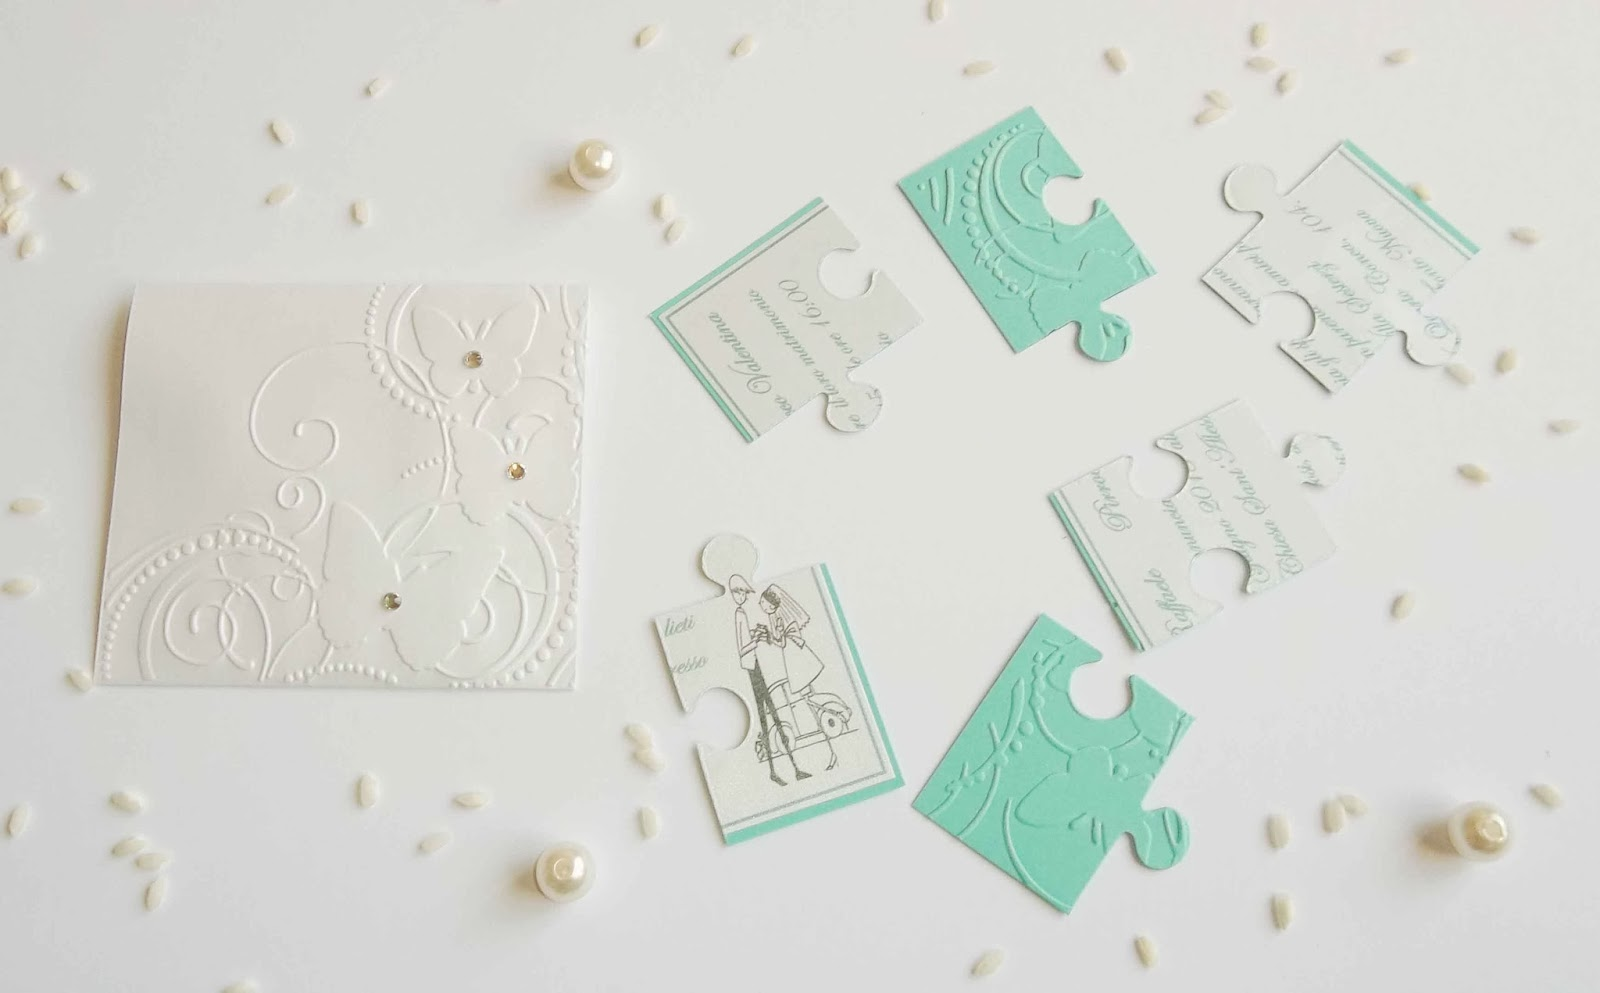 Matrimonio Tema Puzzle : Sara crea partecipazioni a puzzle per matrimoni